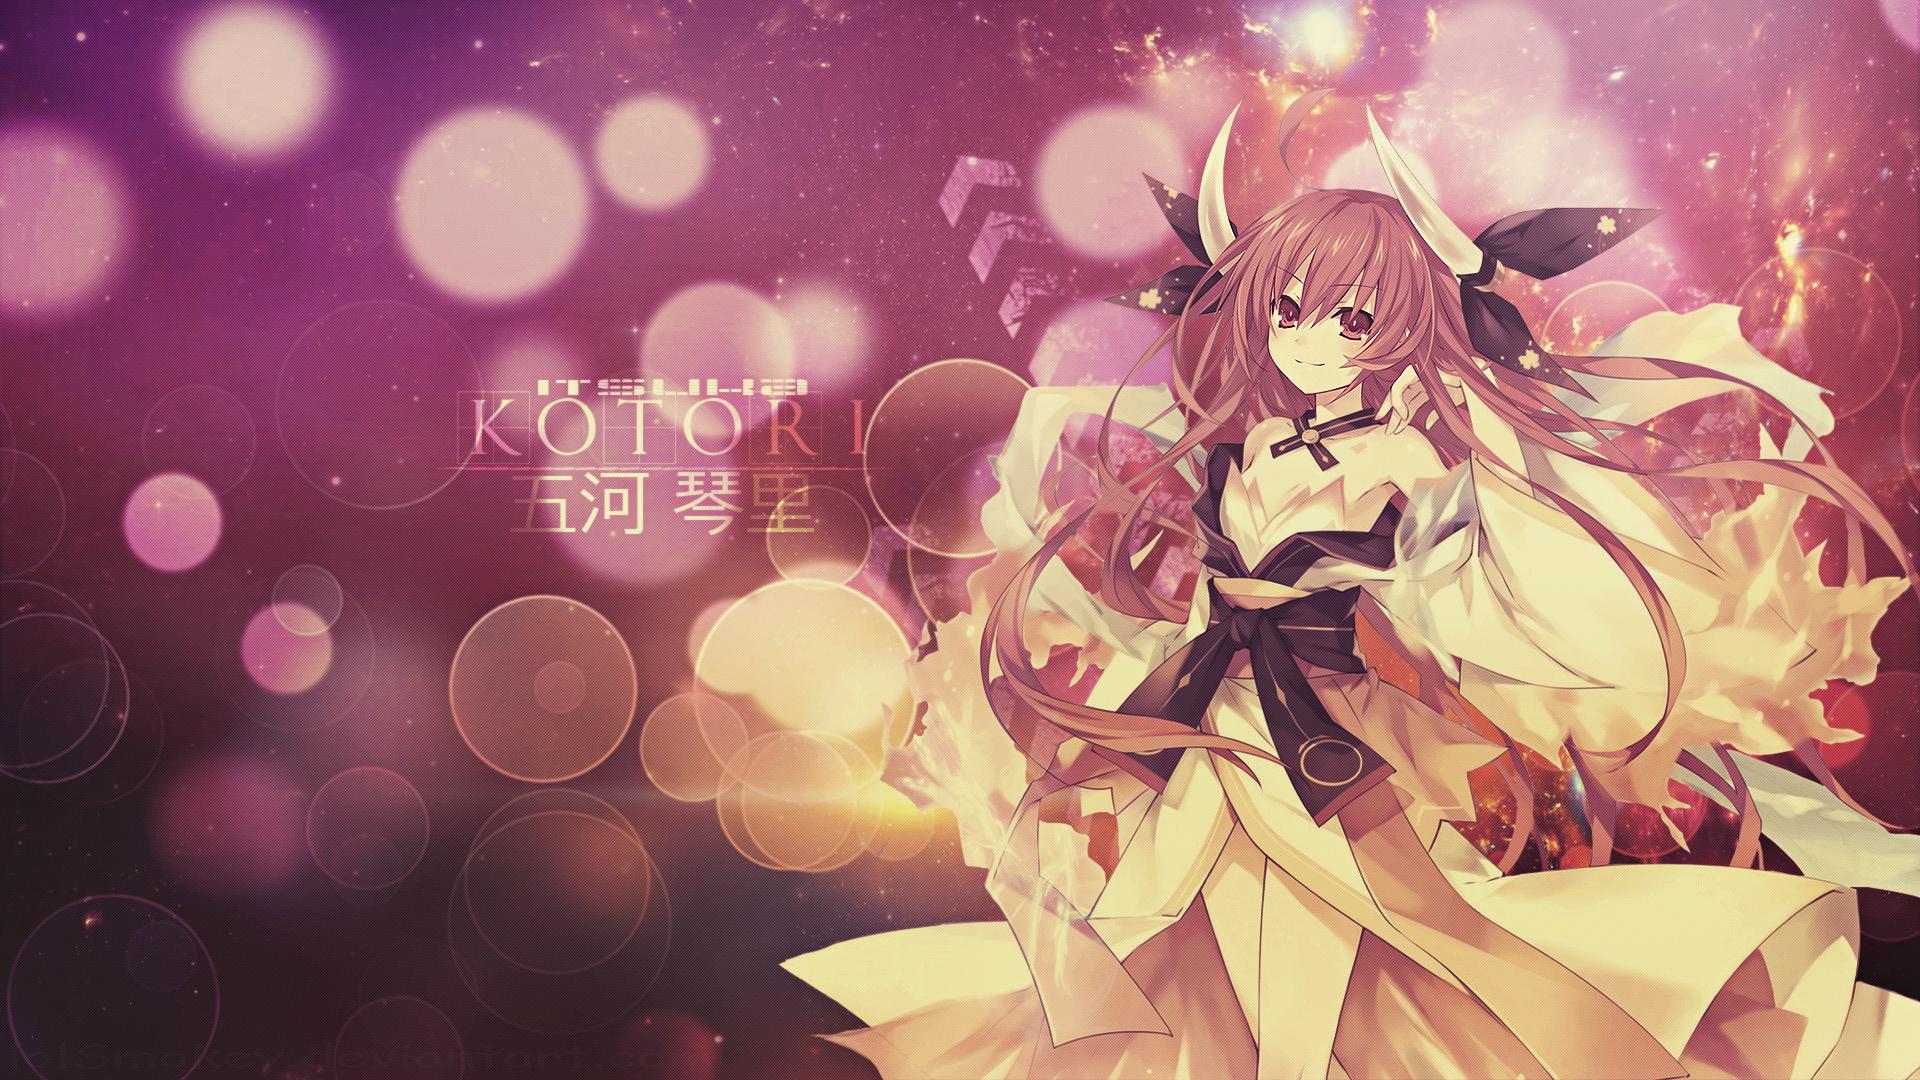 Anime 1920x1080 anime anime girls Date A Live Itsuka Kotori